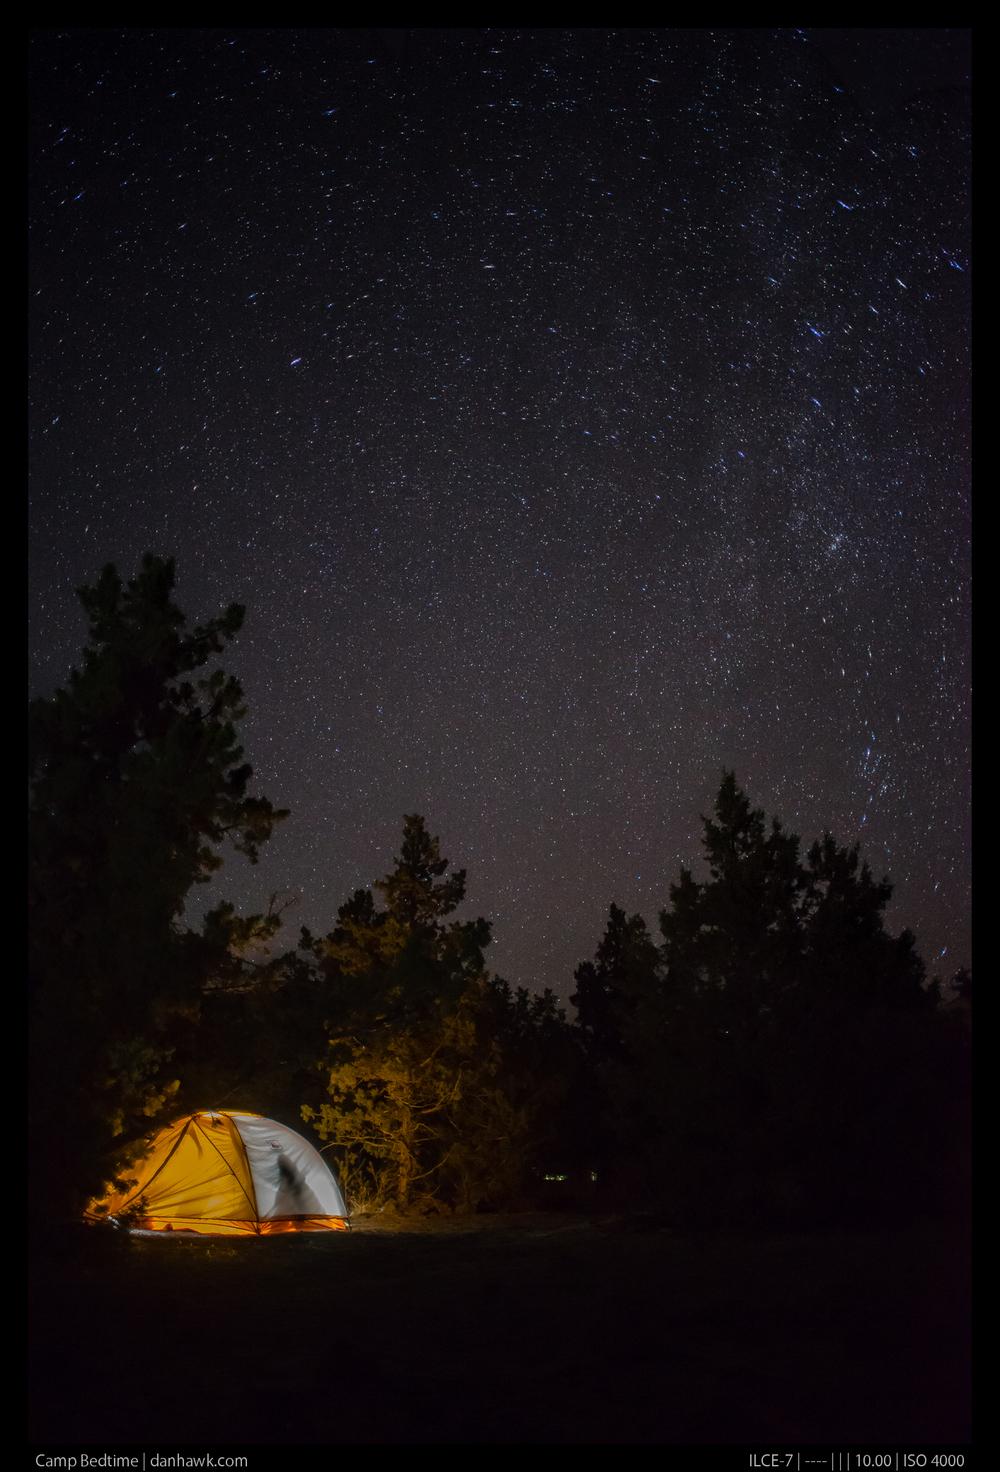 Camp Bedtime